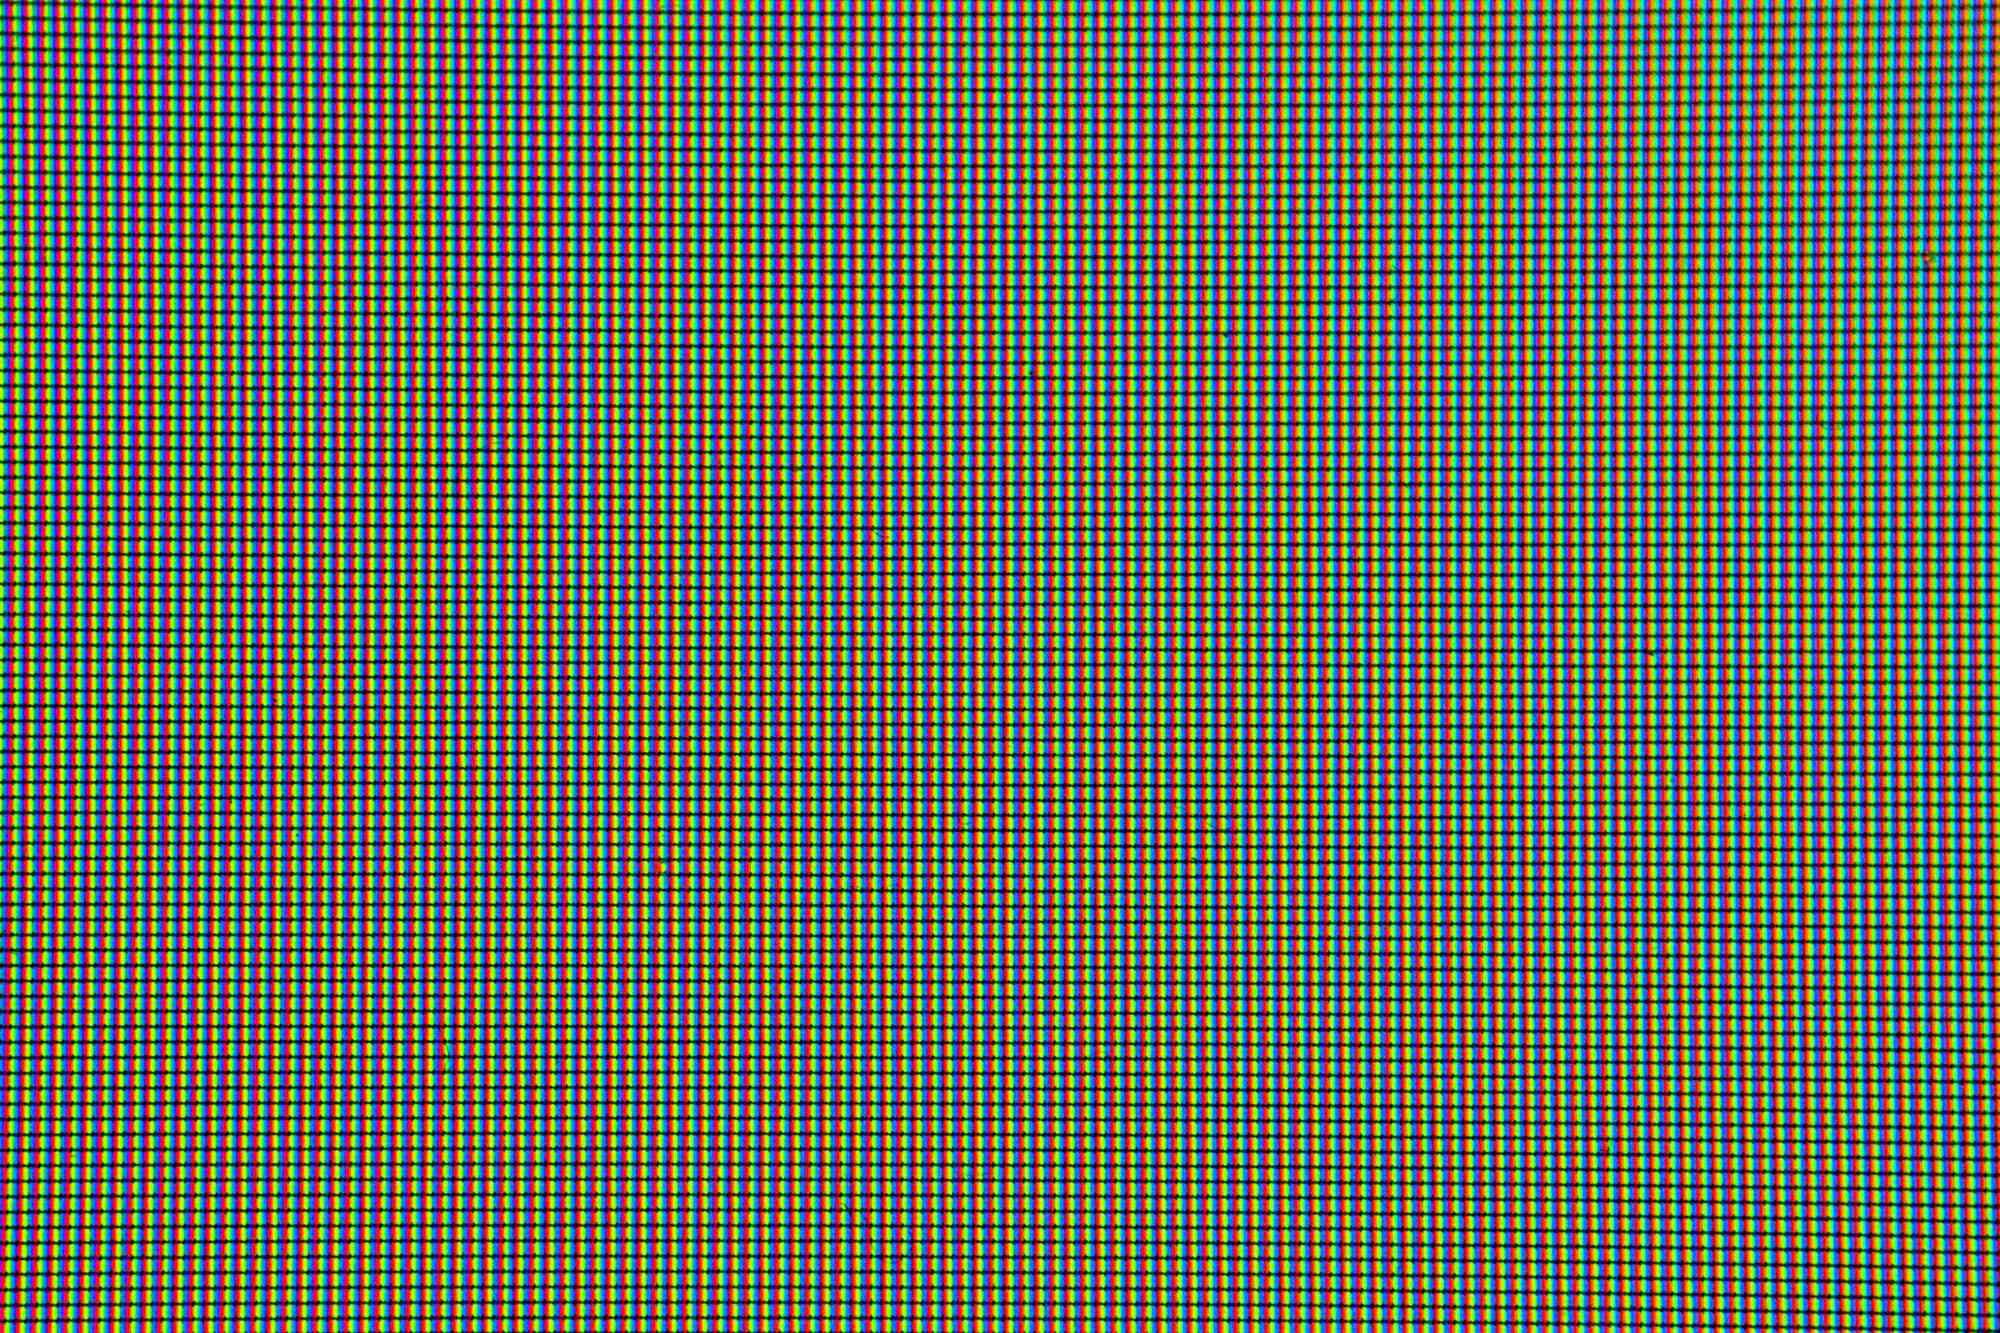 Pixel Display in screen